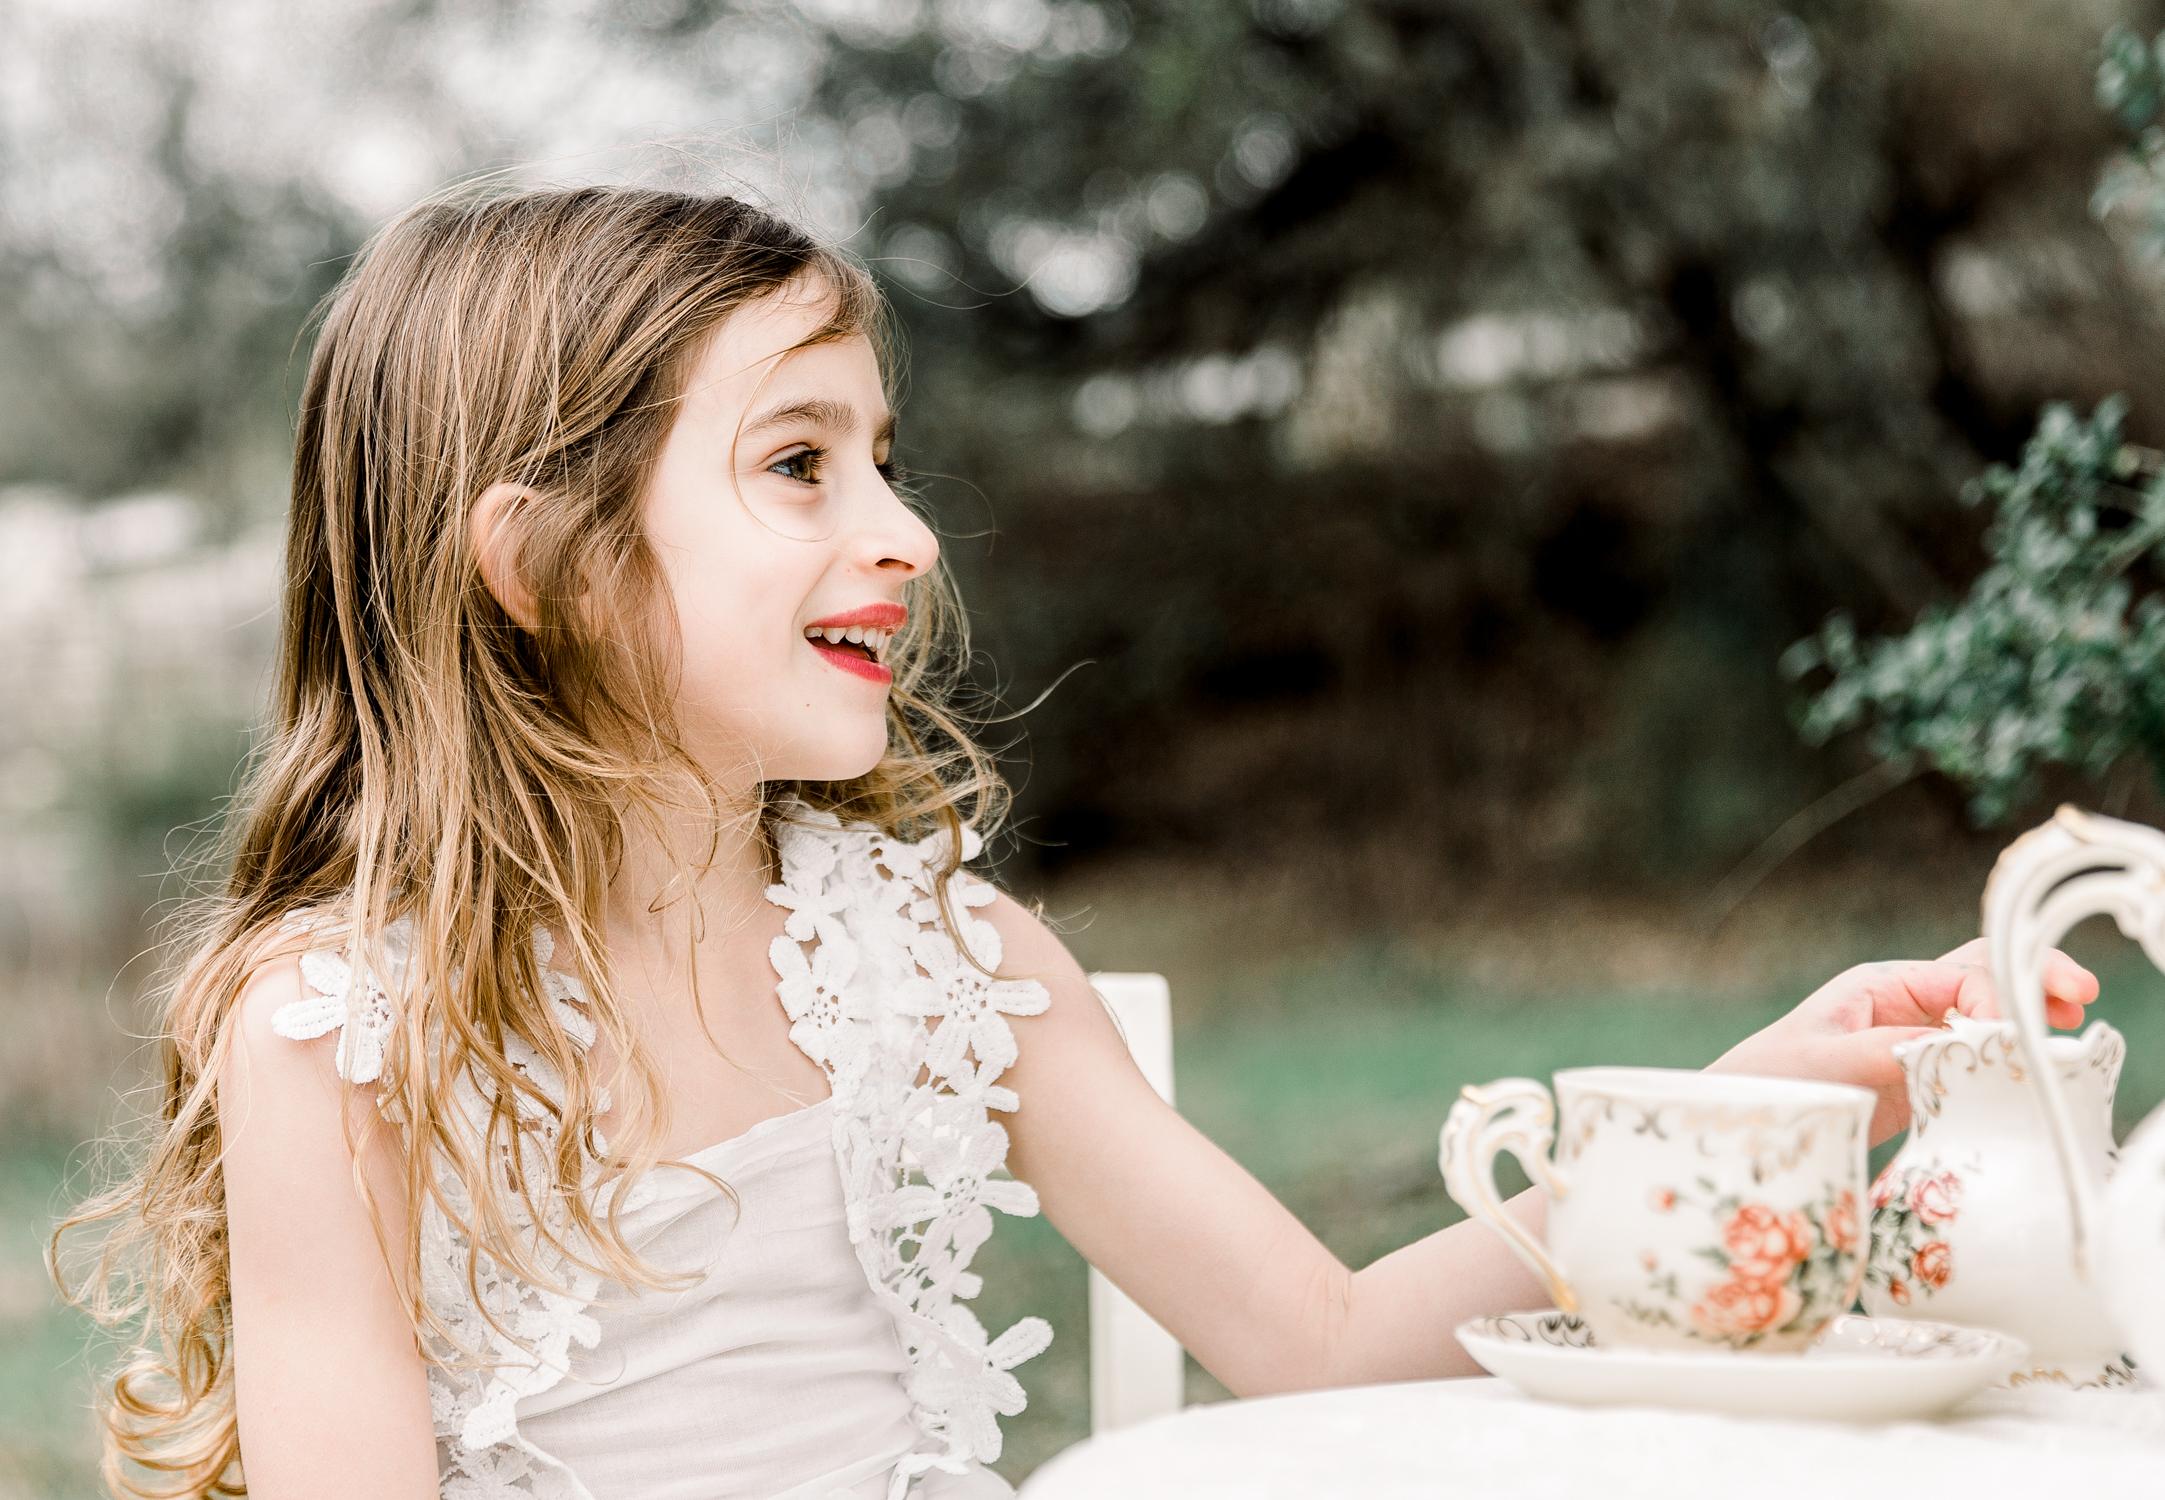 lifestyle-family-photographer-franklin-tea-time-19.jpg